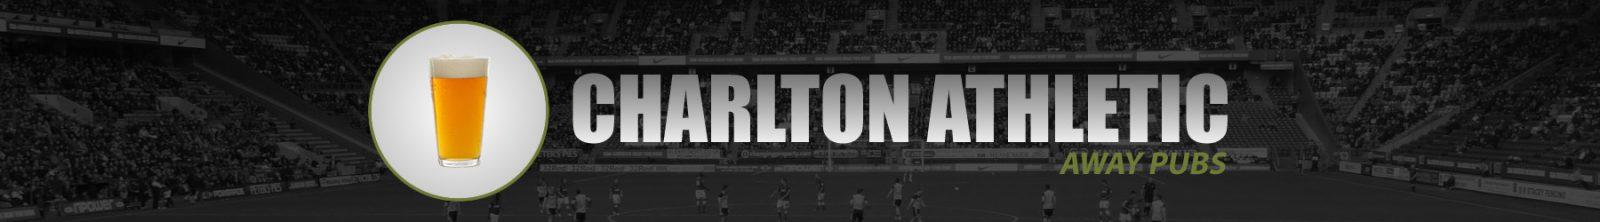 Charlton Athletic Away Pubs